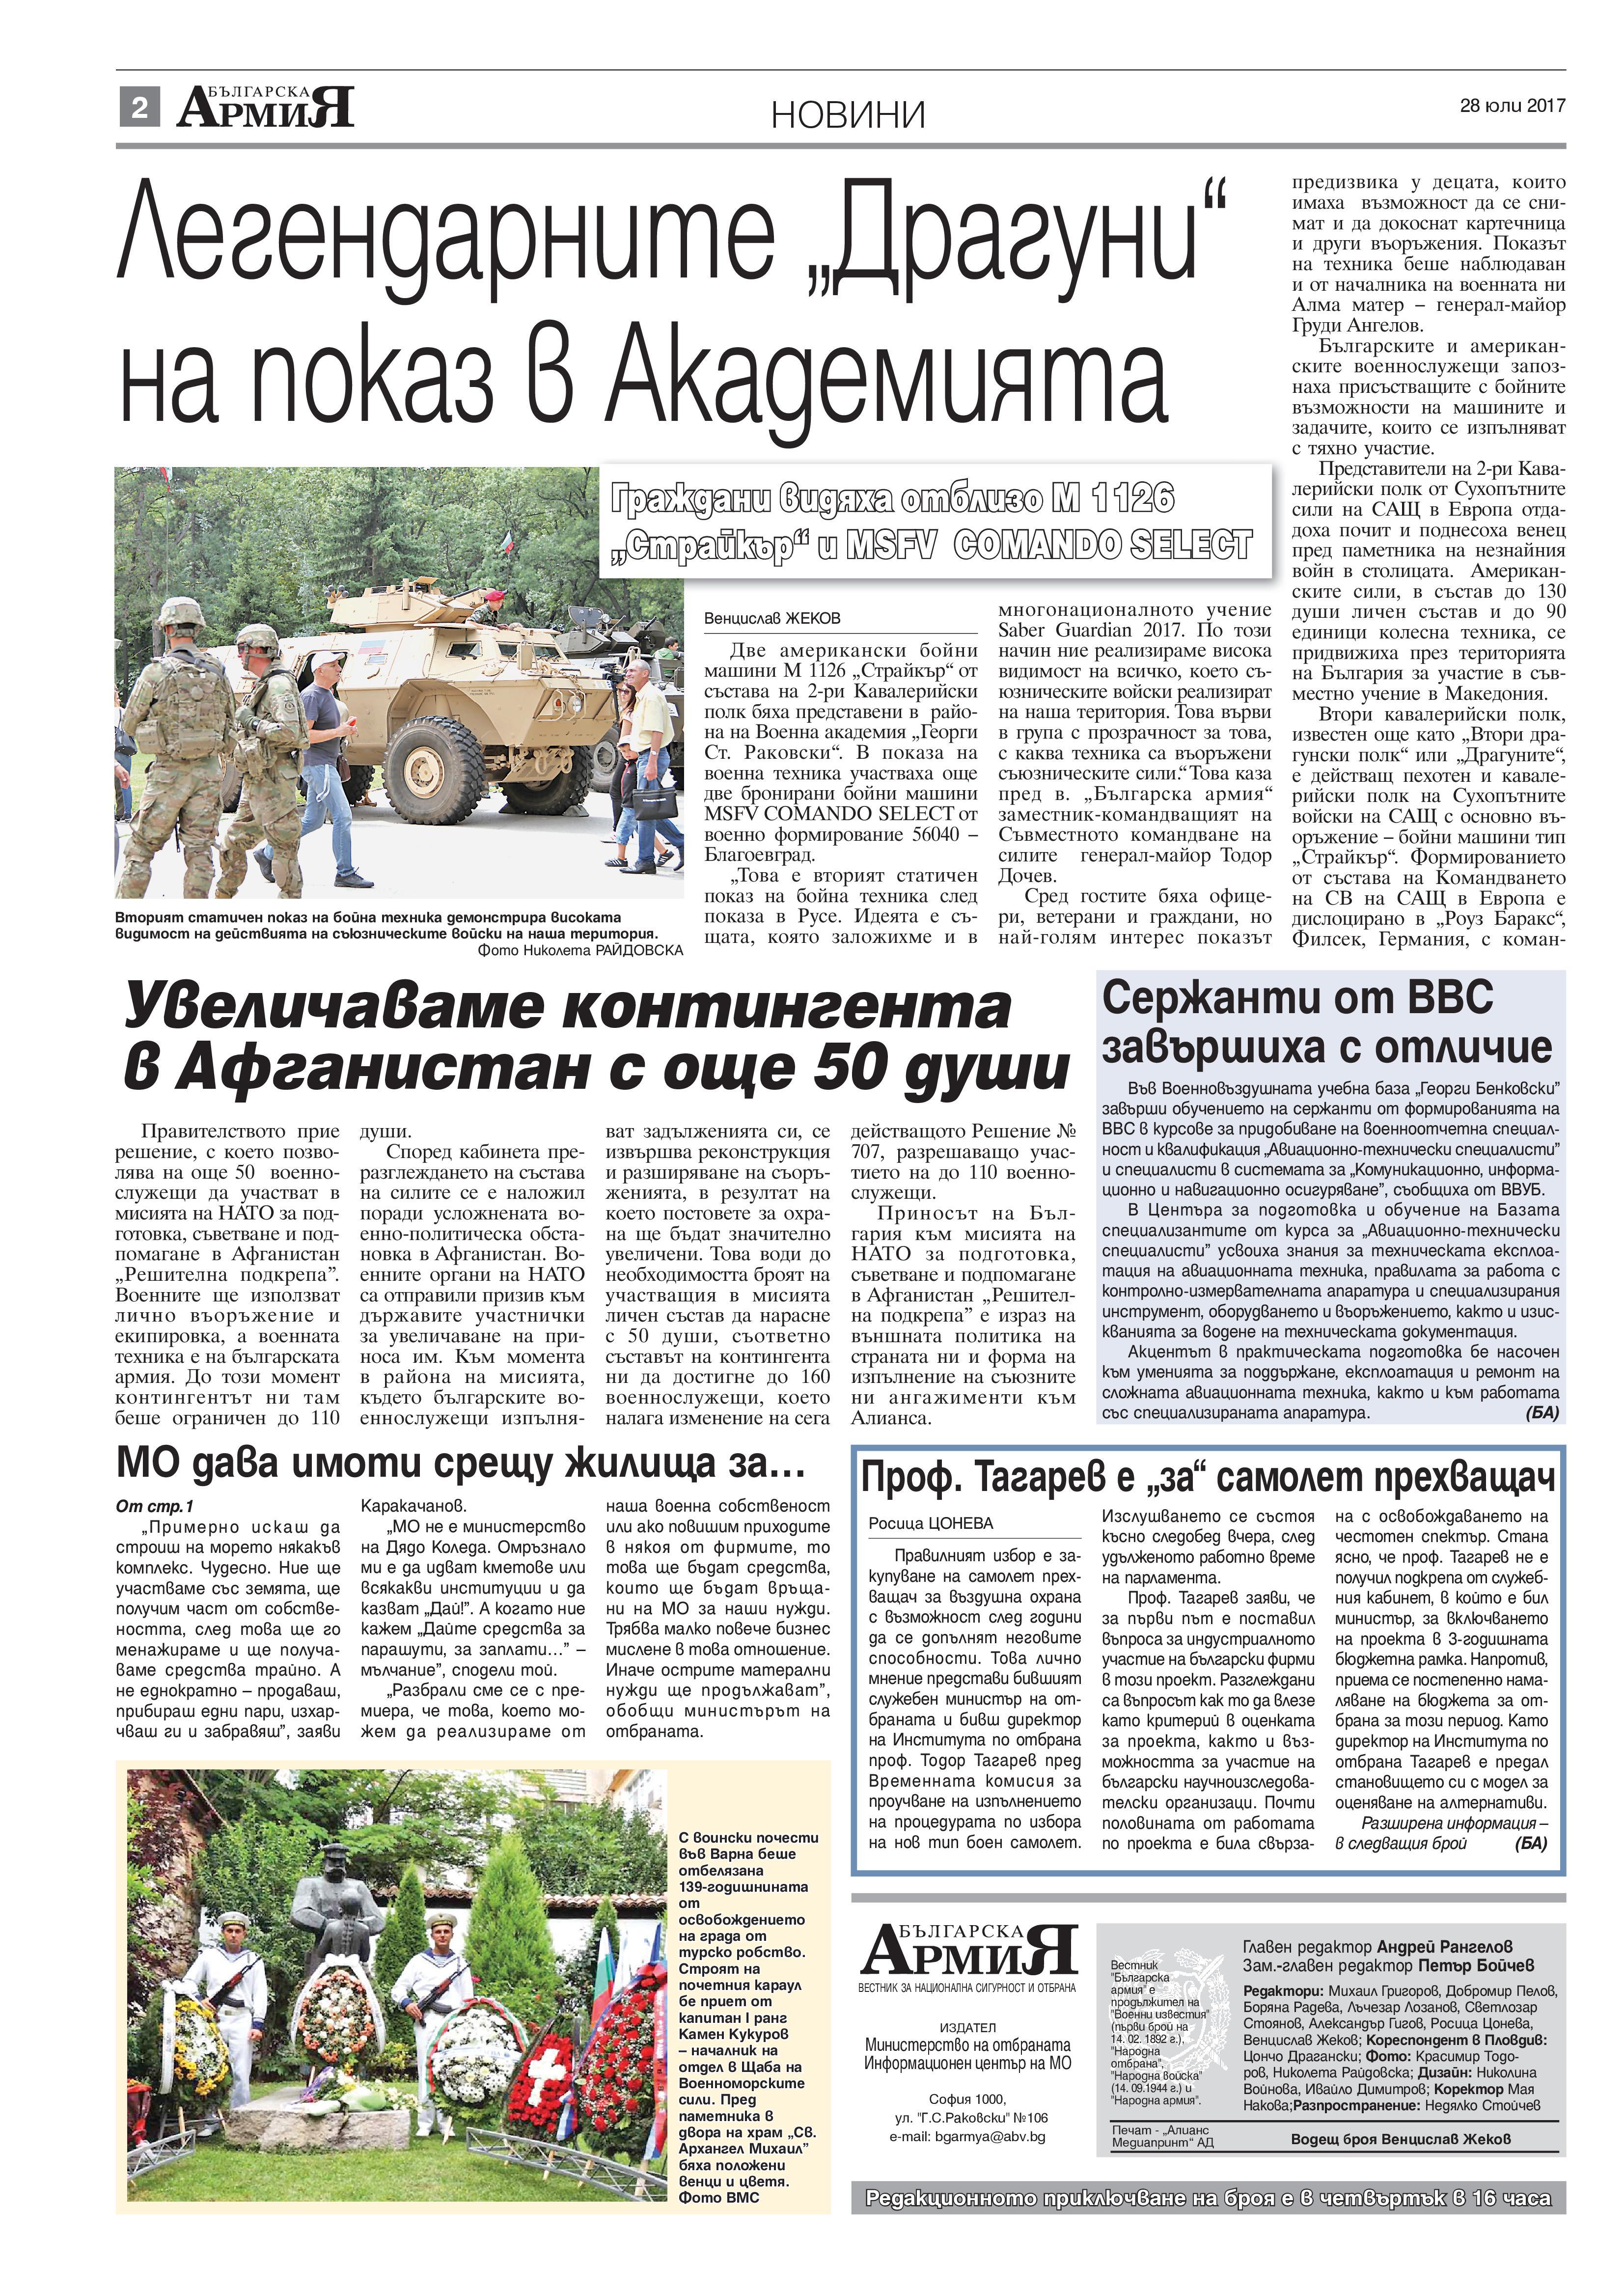 https://www.armymedia.bg/wp-content/uploads/2015/06/02-6.jpg